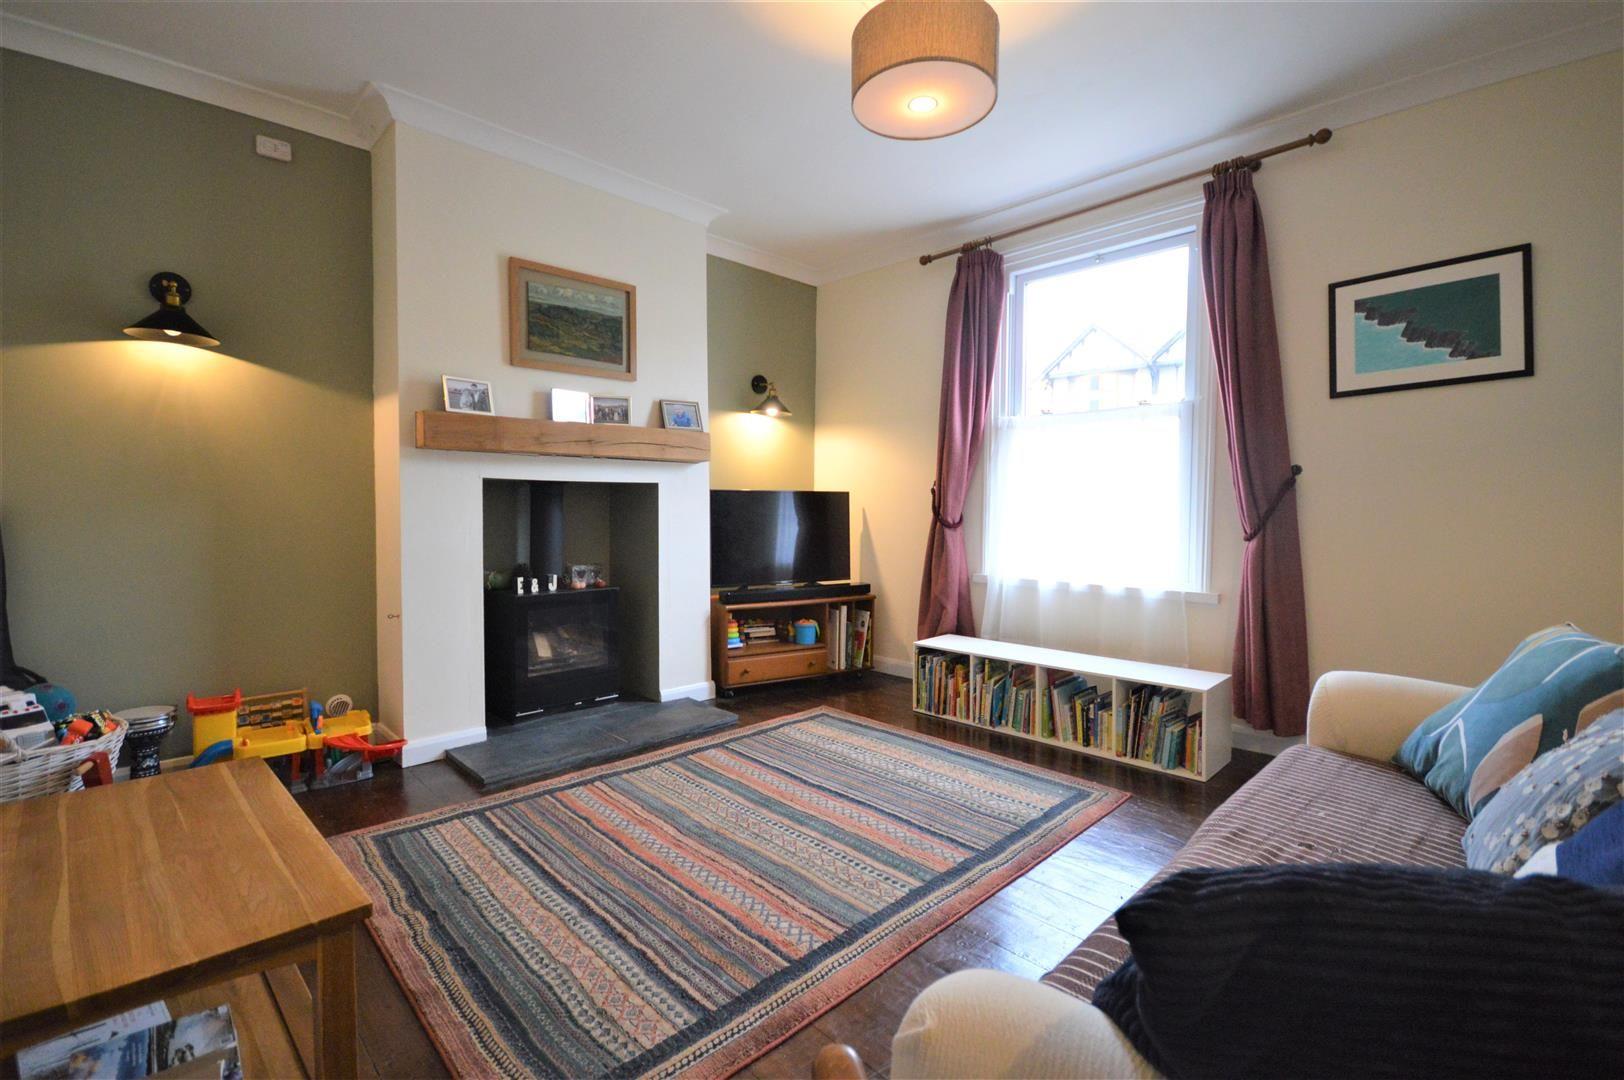 3 bed detached for sale in Leominster 3